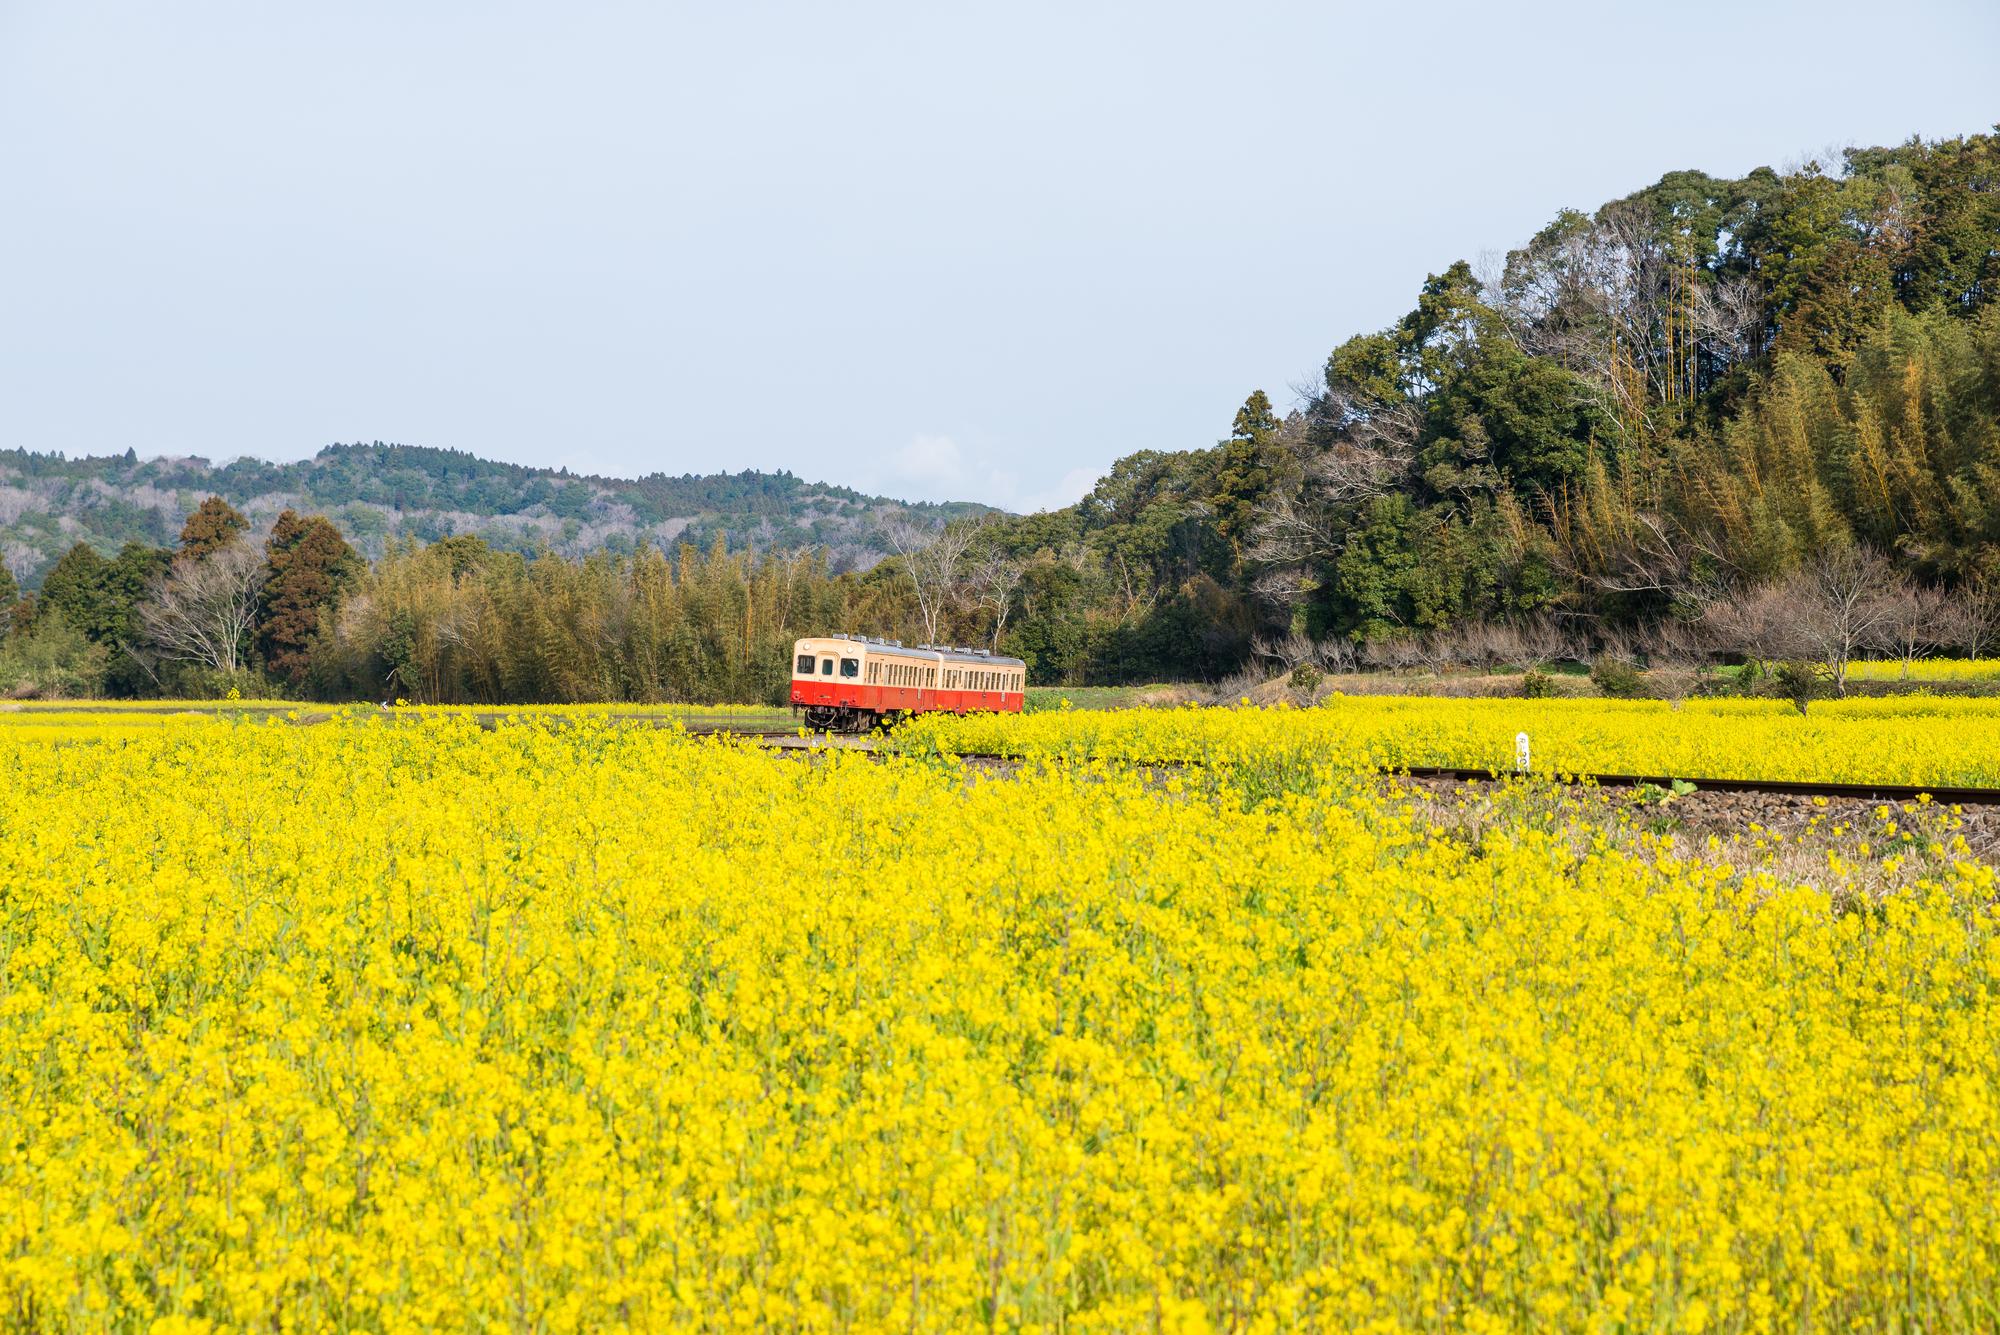 小湊鉄道と石神の菜の花畑 (千葉県市原市石神) 2017年4月撮影